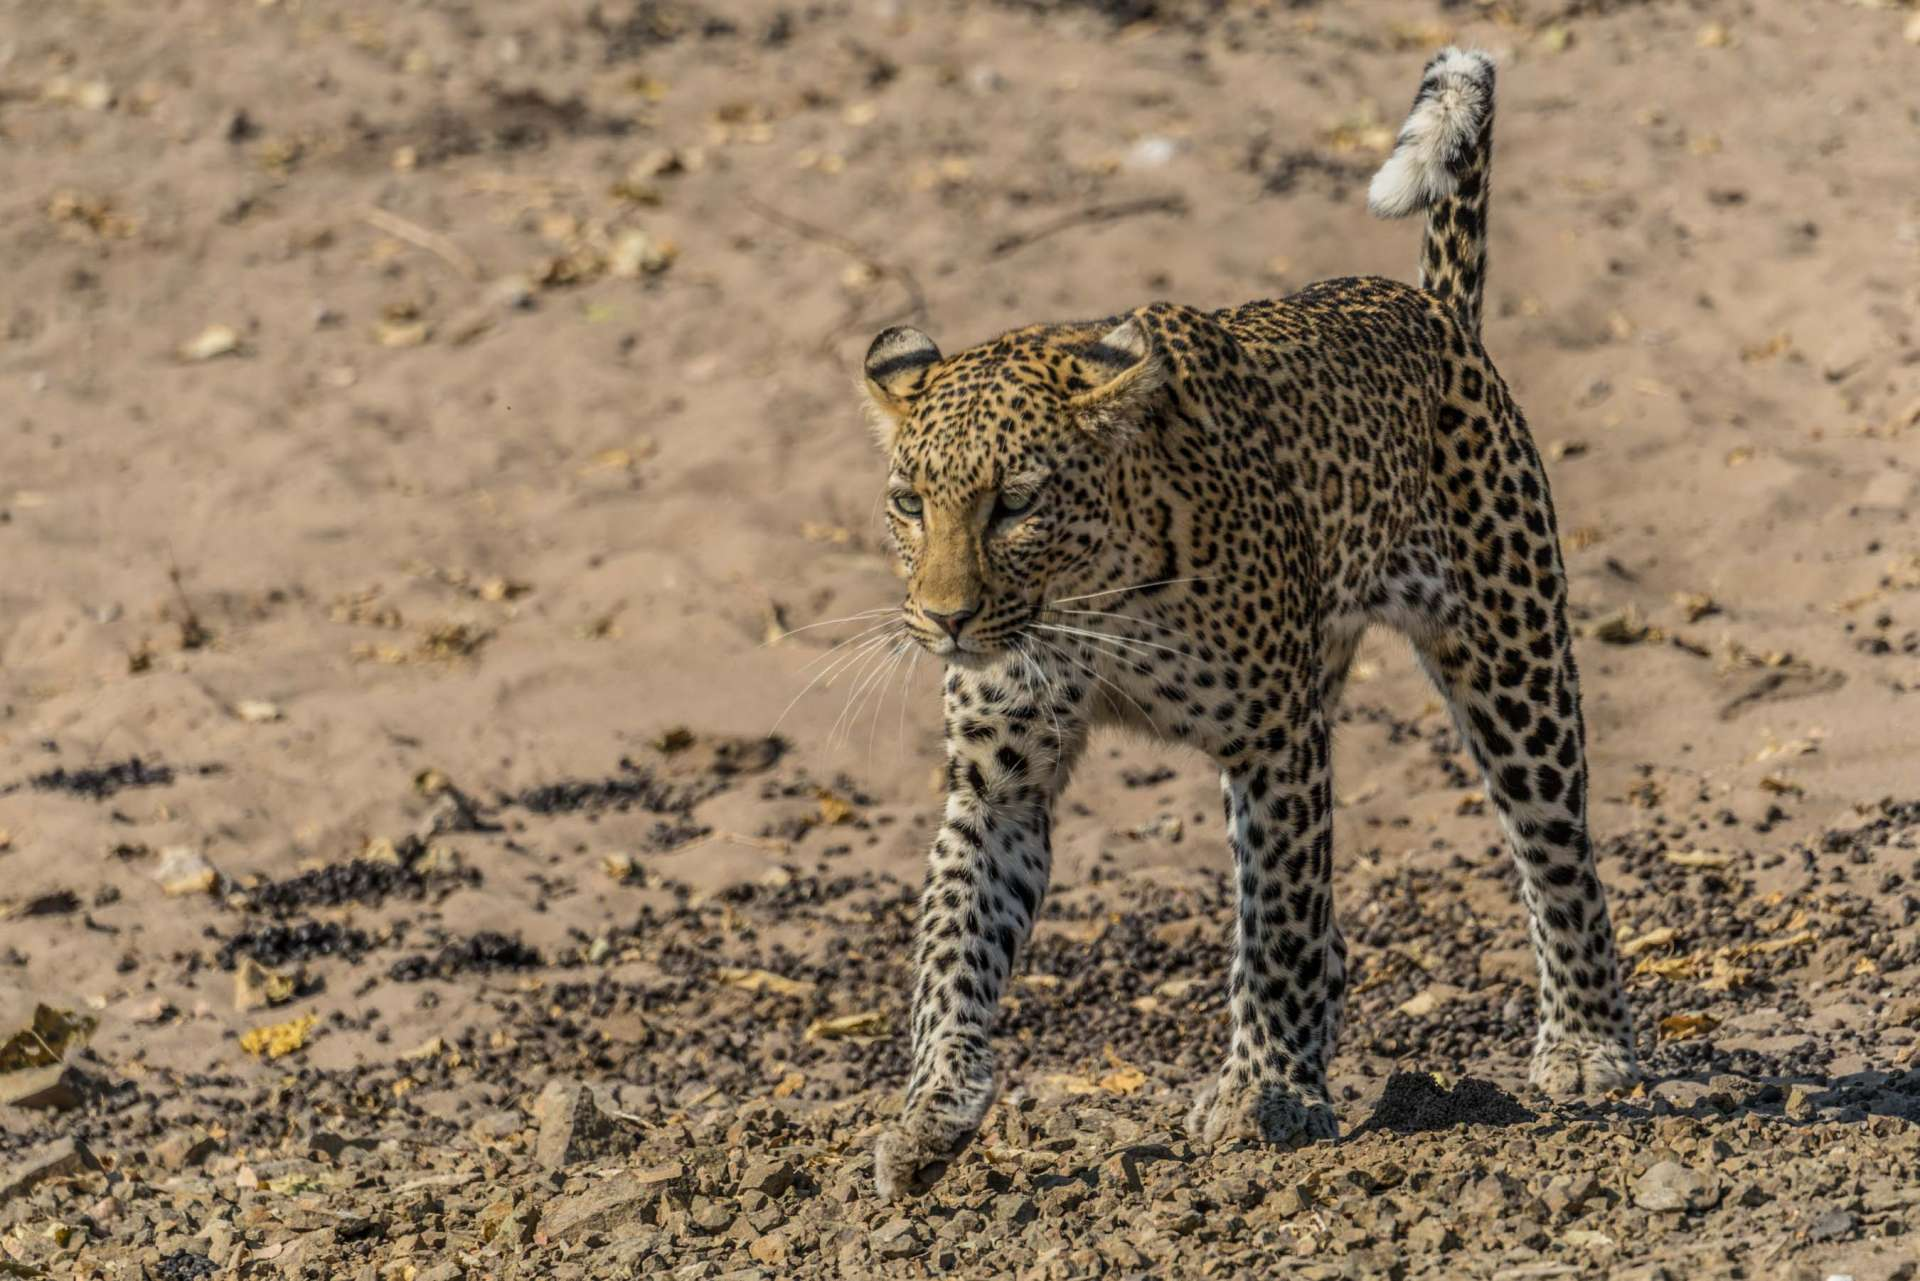 Victoria Falls Zimbawe Enrico Pescantini Chobe day trip leopard